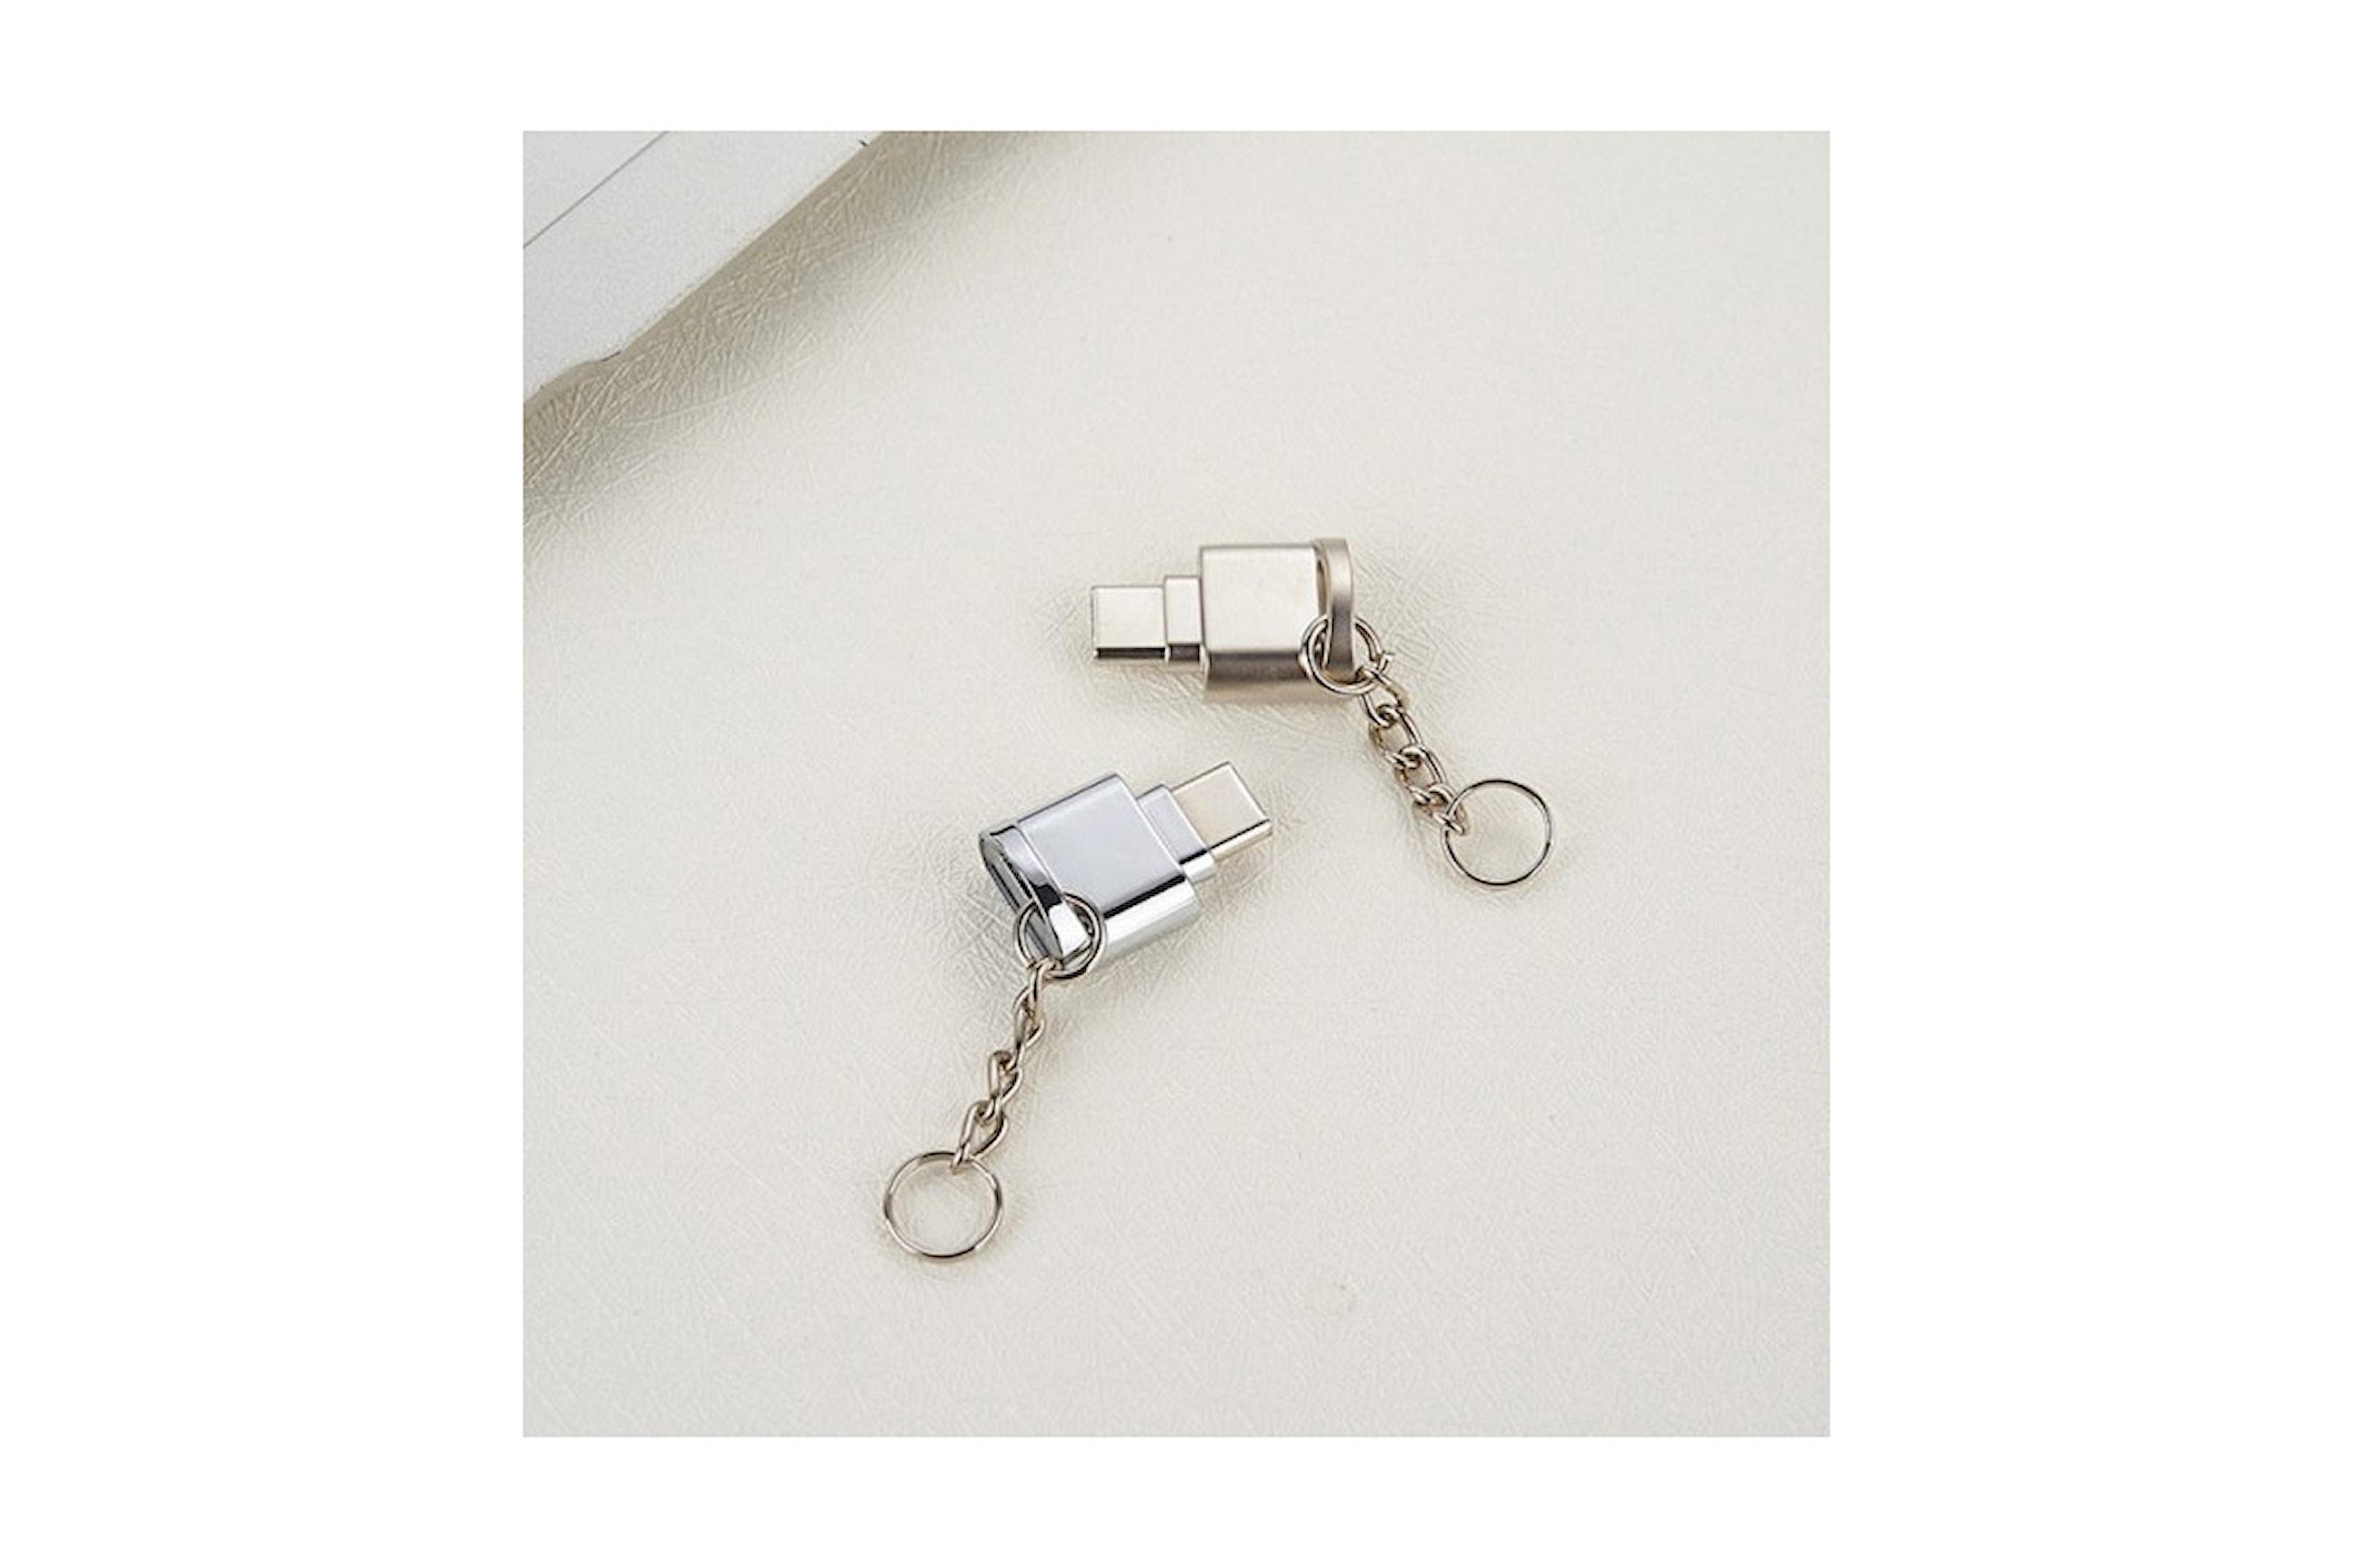 Minneskortsläsare, USB-C